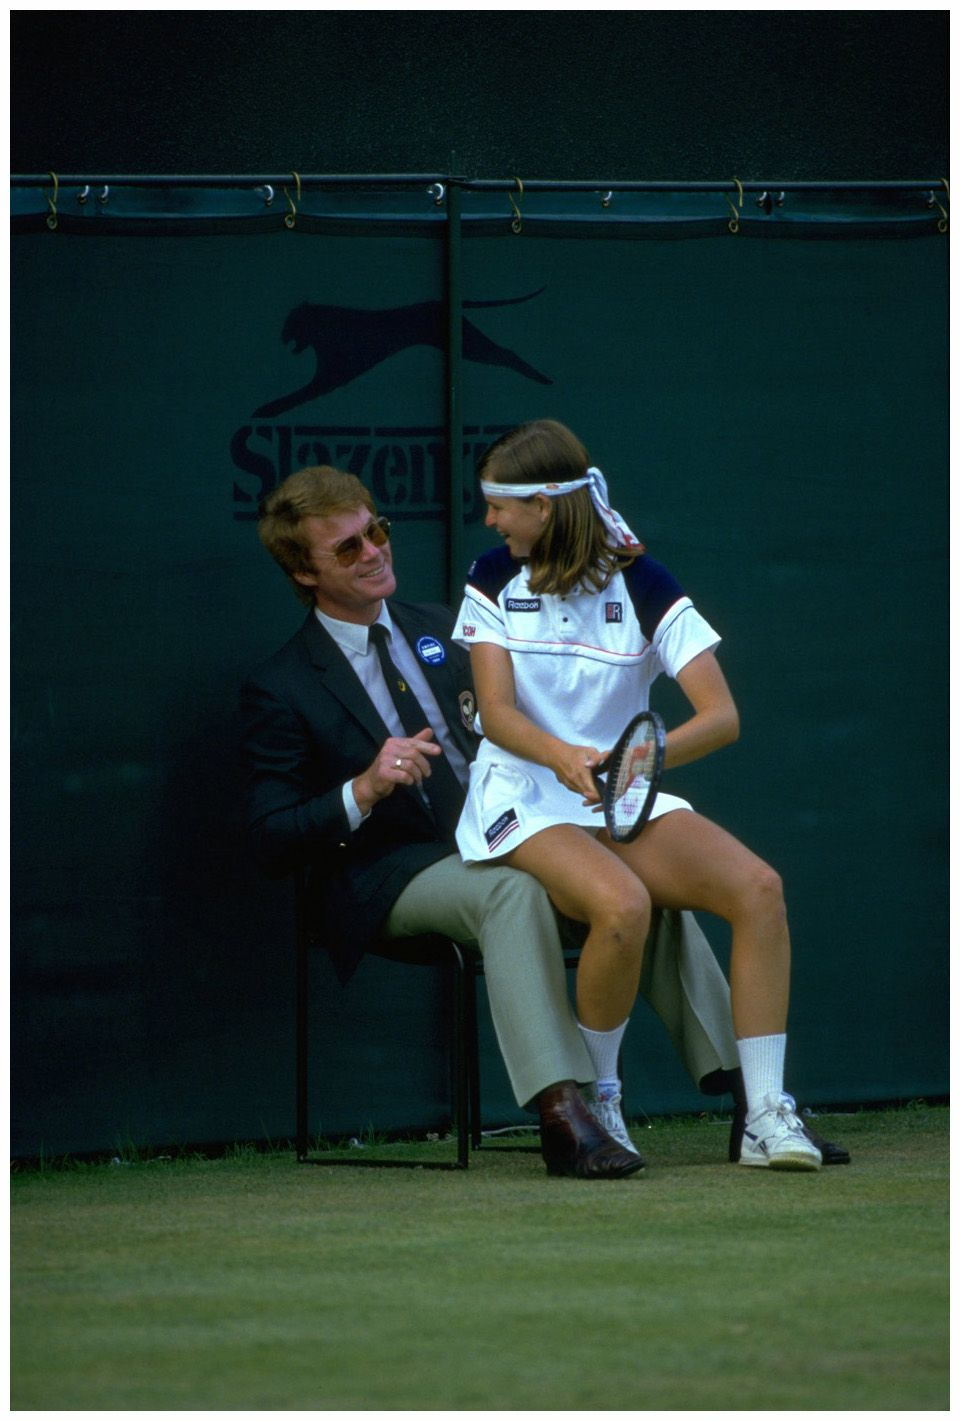 Hana mandlikova lapdancer wimbledon 1984 spor